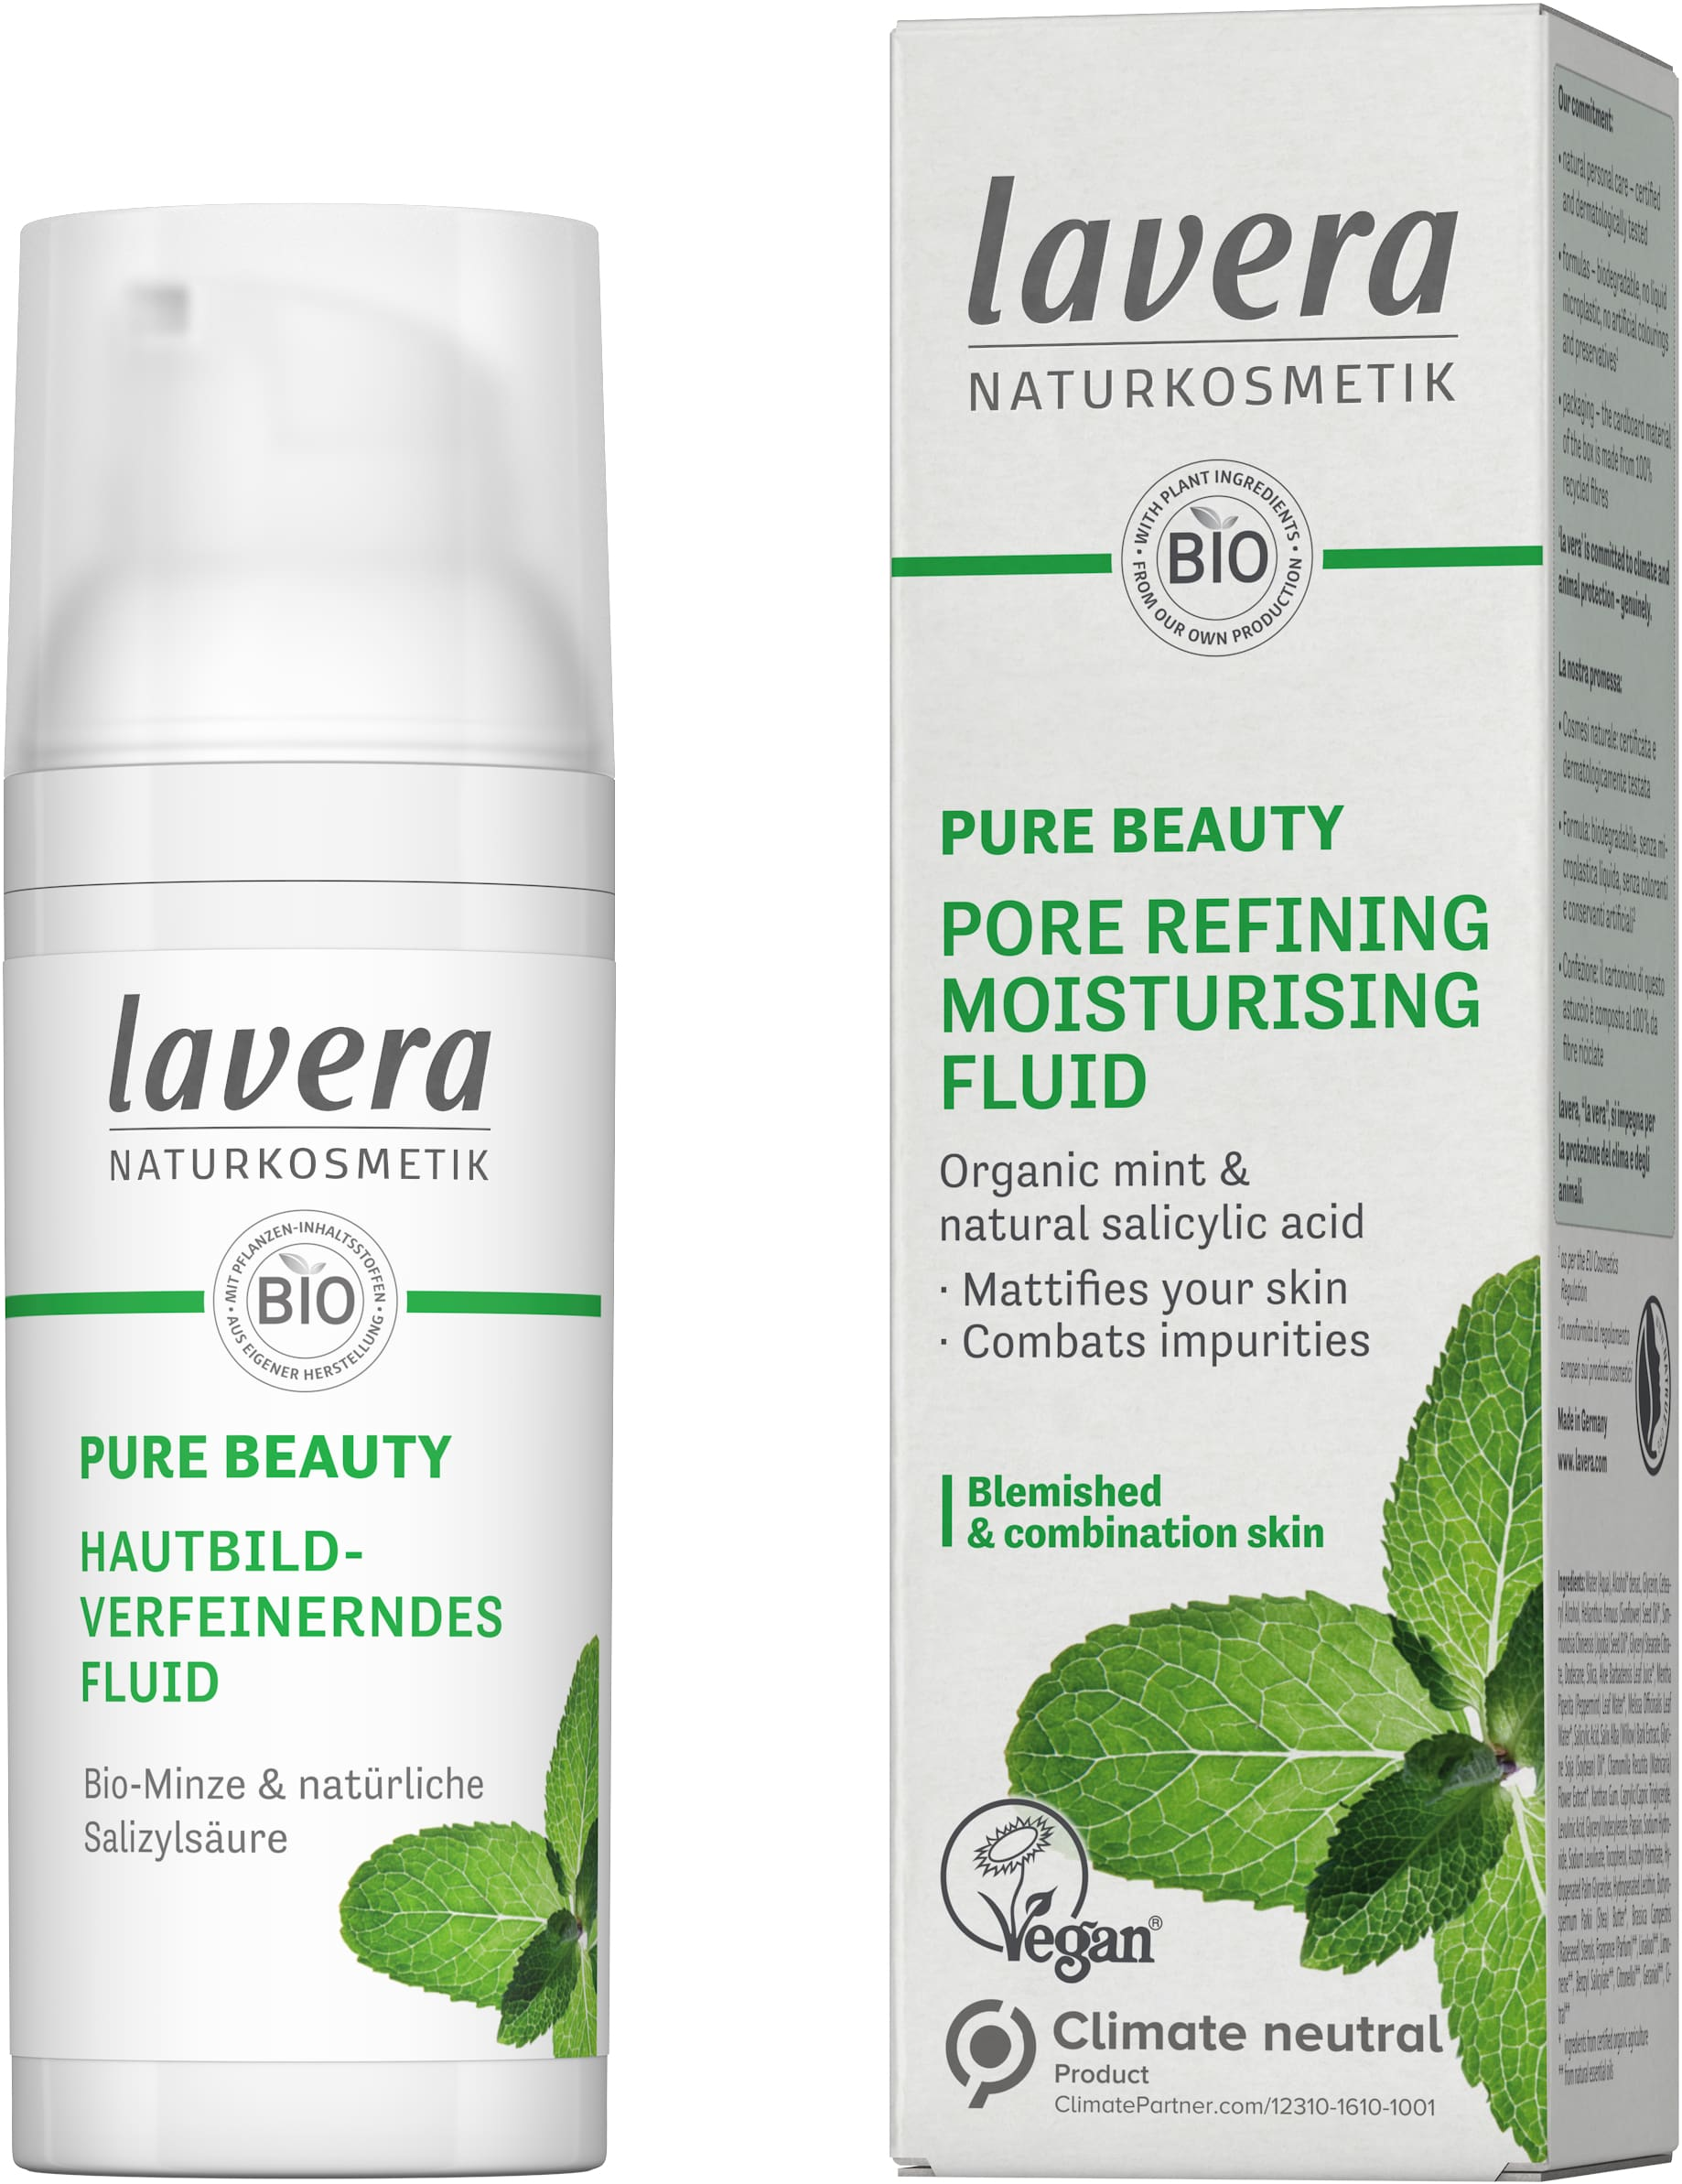 PURE BEAUTY Pore Refining Moisturising Fluid